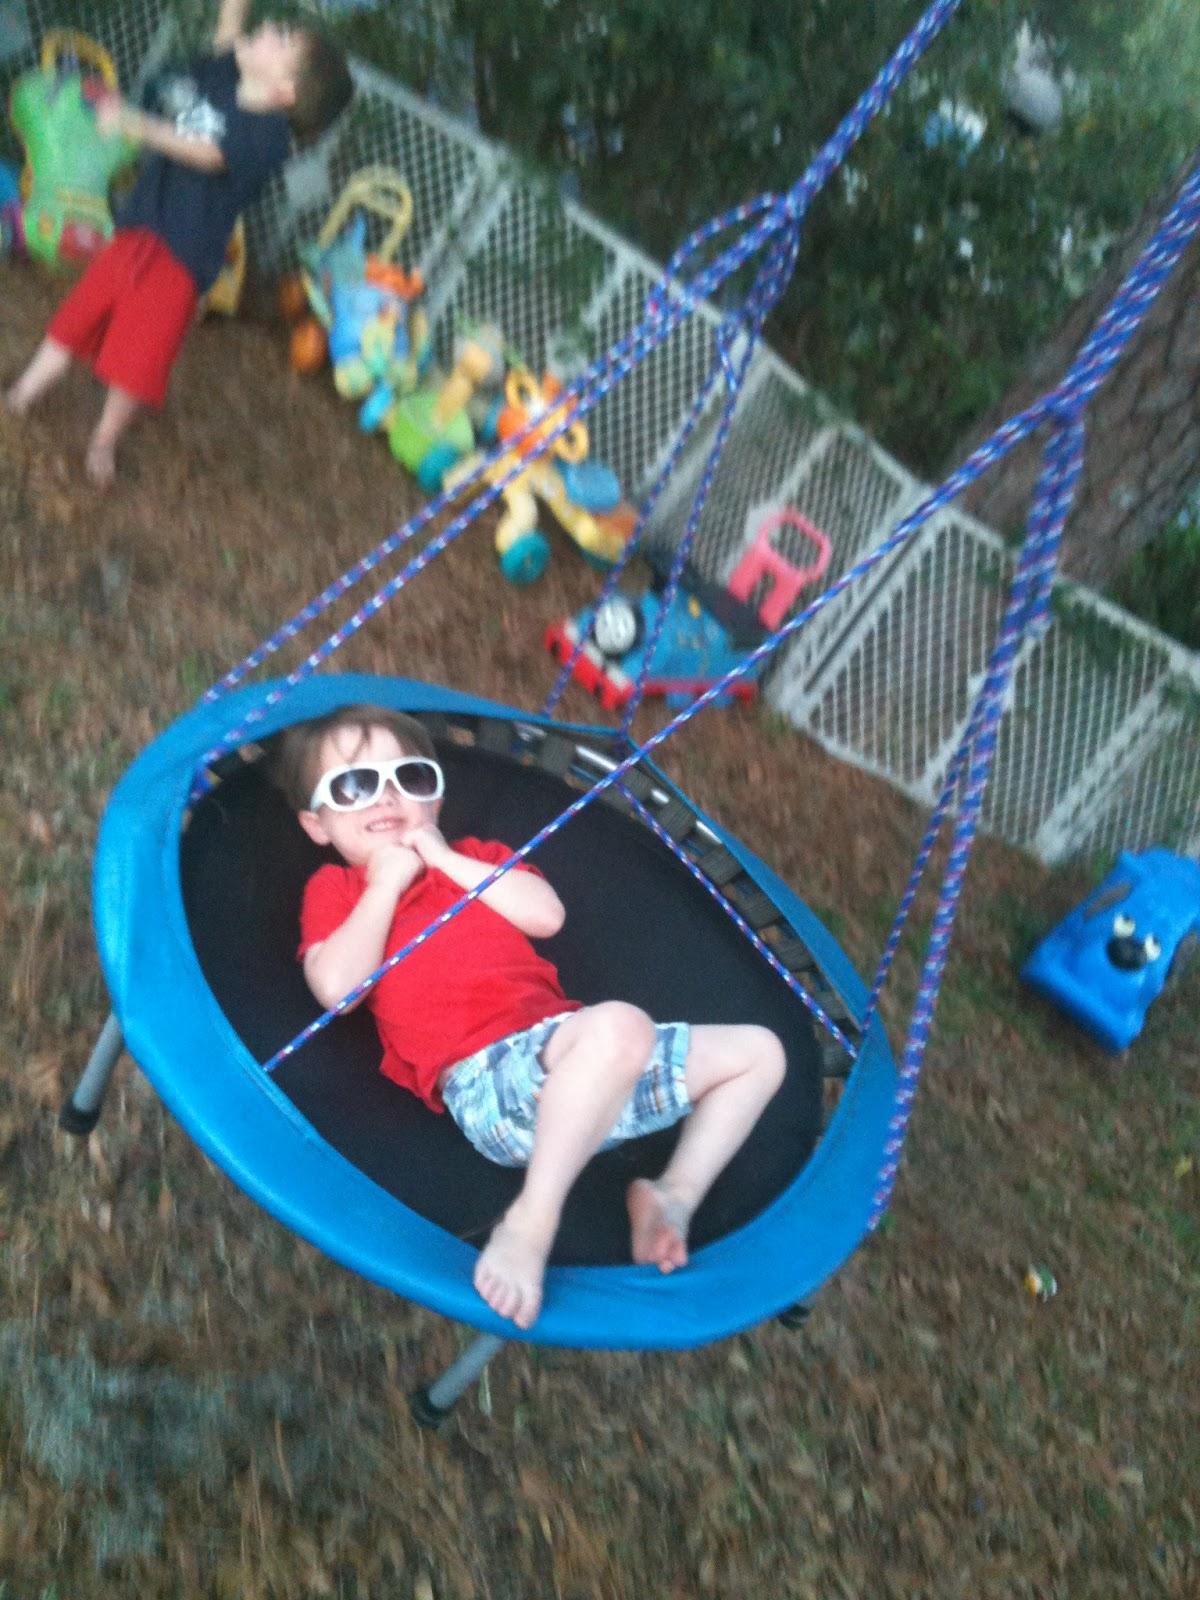 Trampo Swing Tarzan Swing Amp Backyard Play Environment